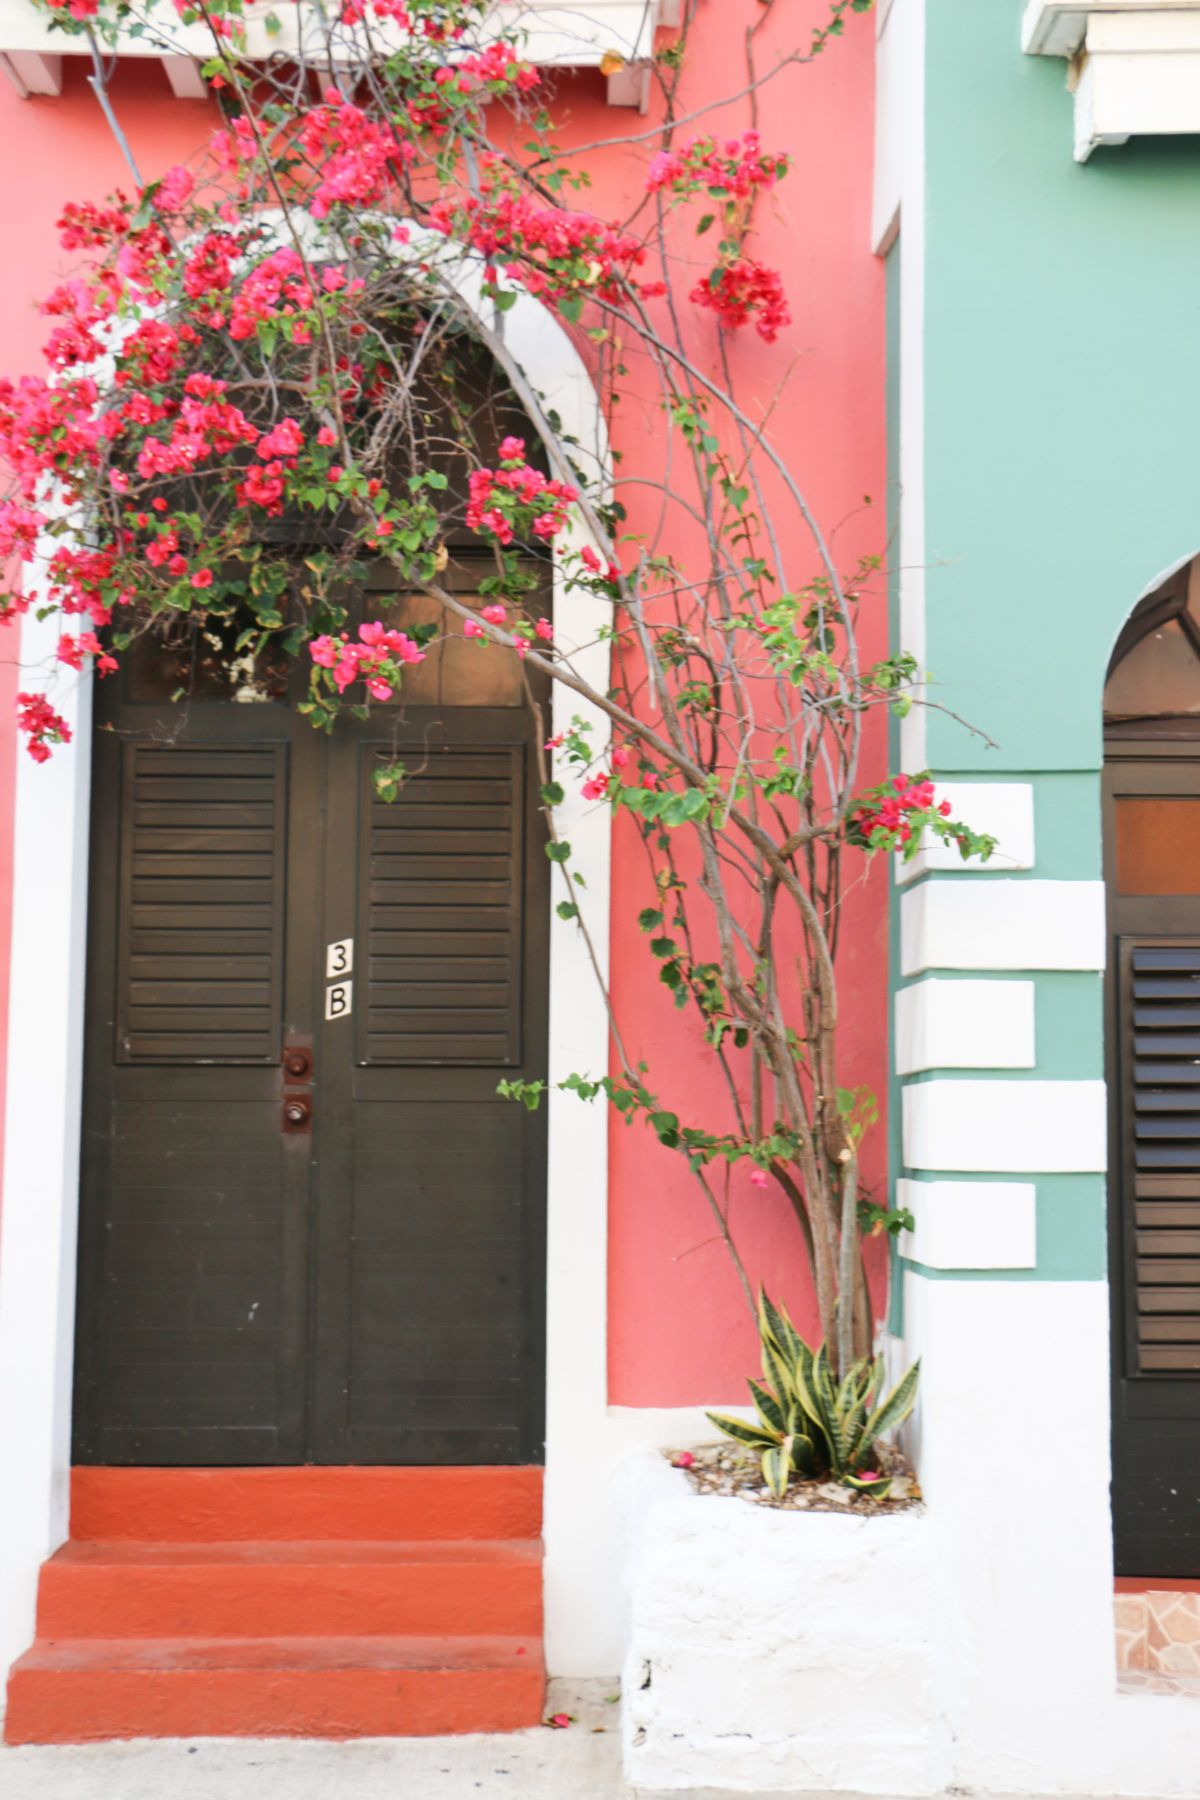 Old San Juan doors \u00a9WCaro Puerto Rico art Casitas 11x14\u201d original oil painting on linen canvas old world facades